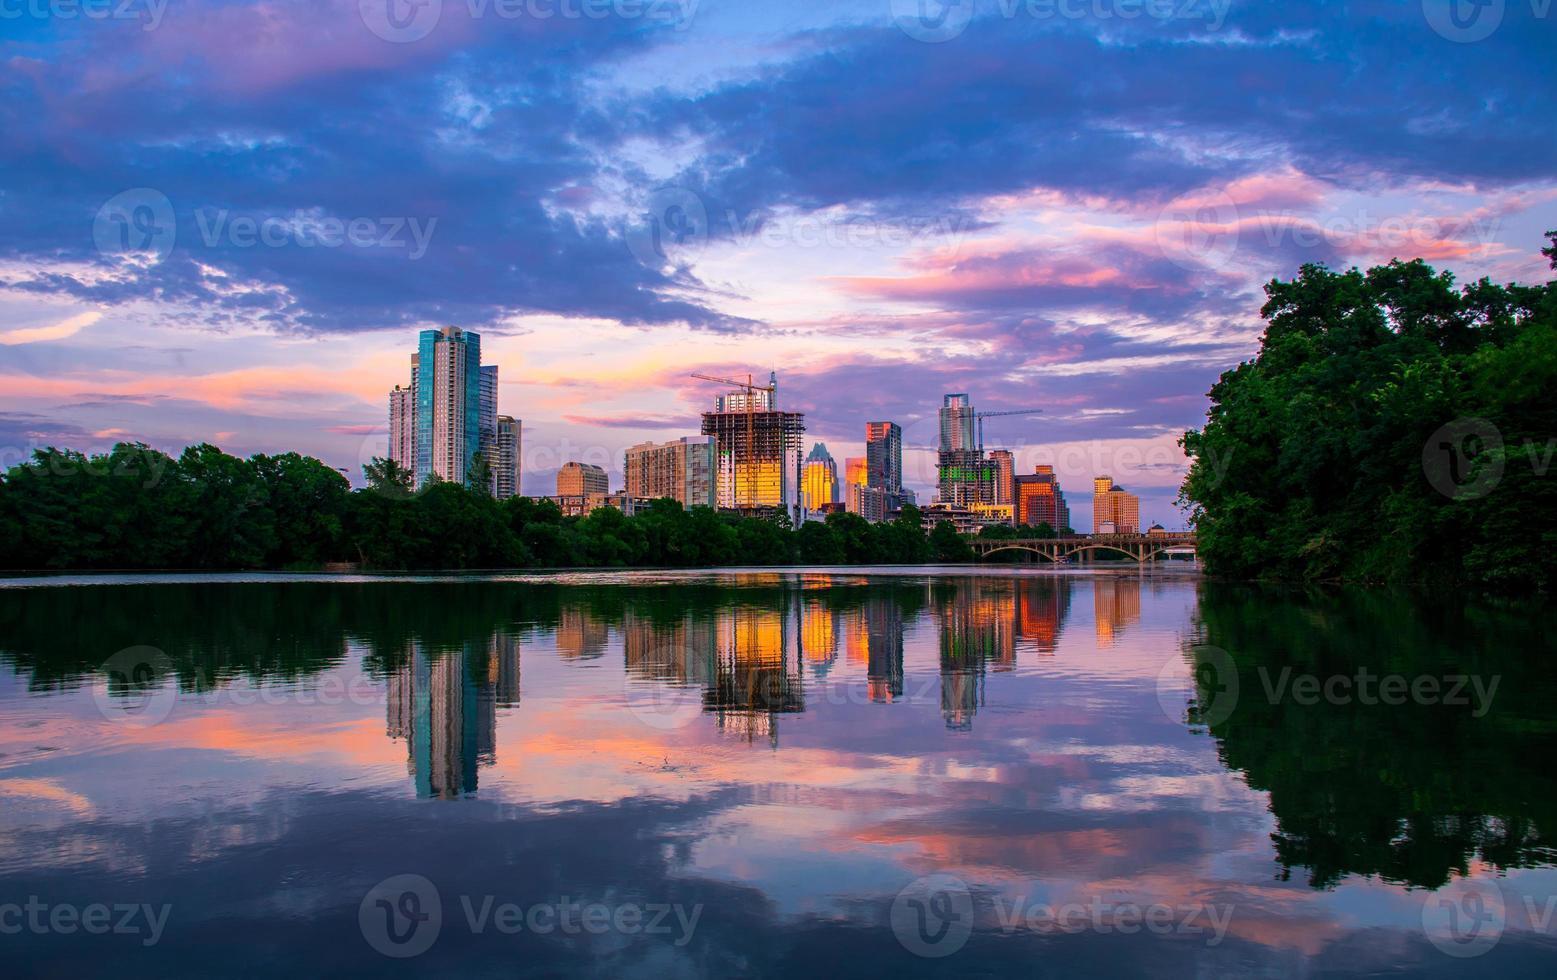 Austin Life Lou Neff Point Mirror Reflection Sunset 2015 photo